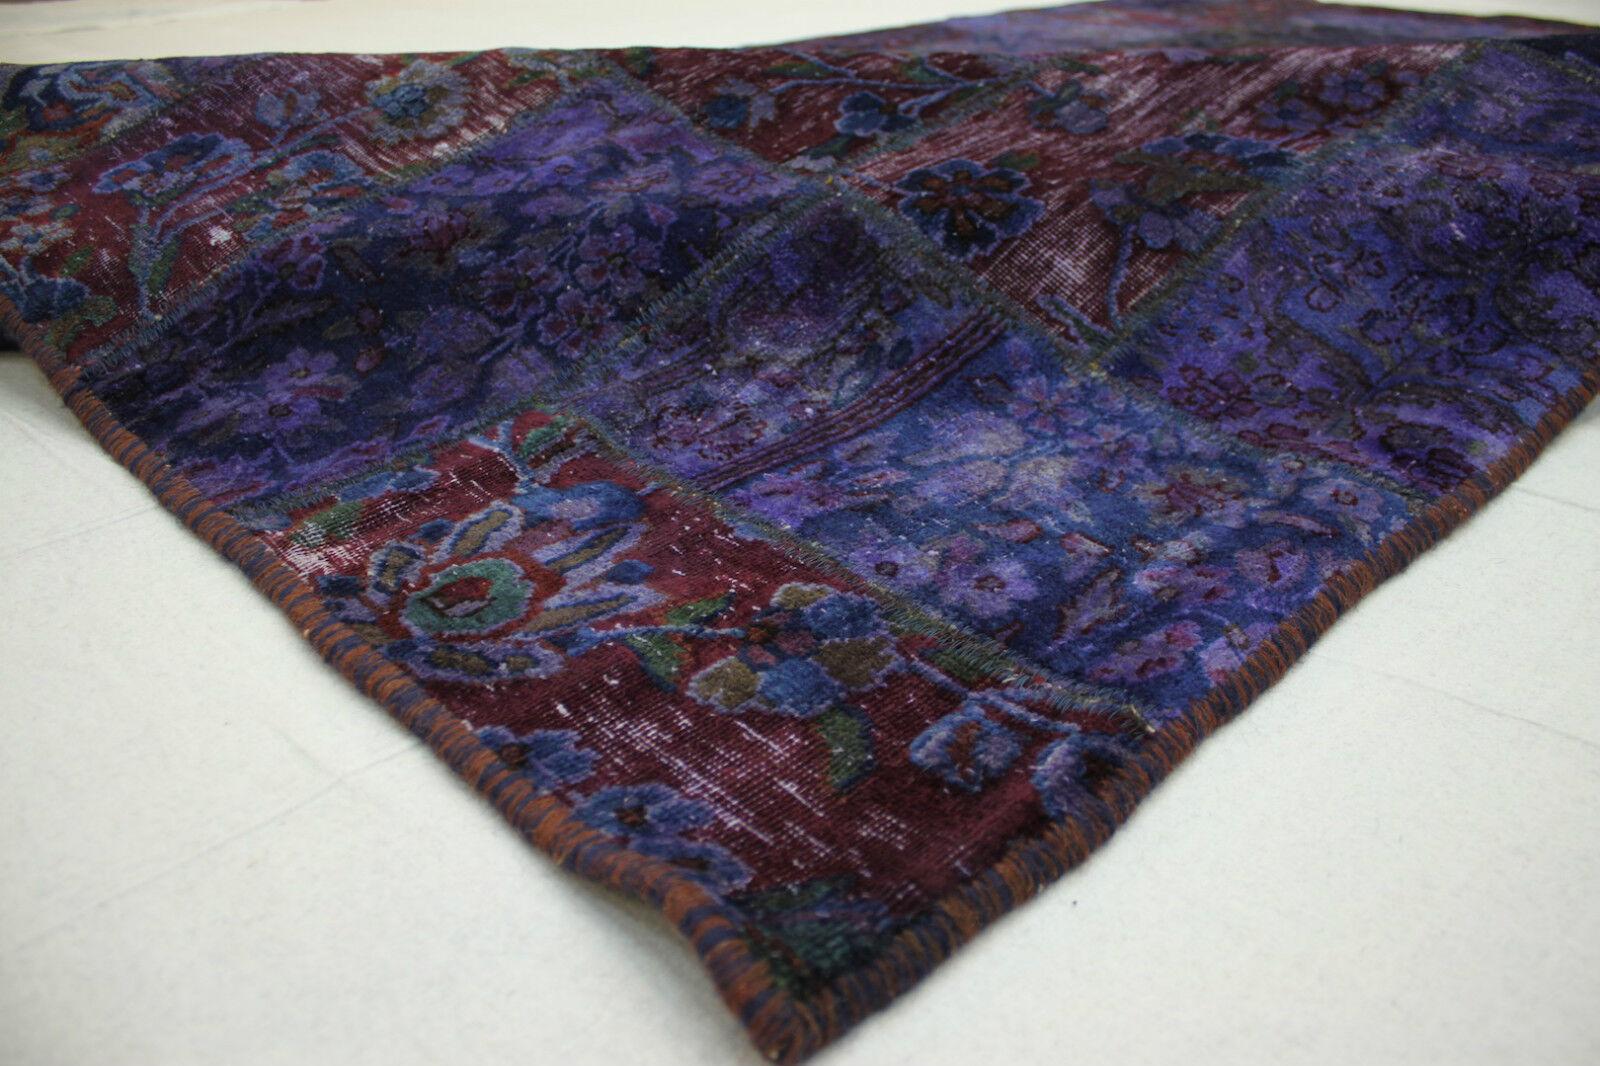 Schöner Orient Teppich Patchwork Vintage lila 300x200 modern Used Used Used Look 1514 10aaf8